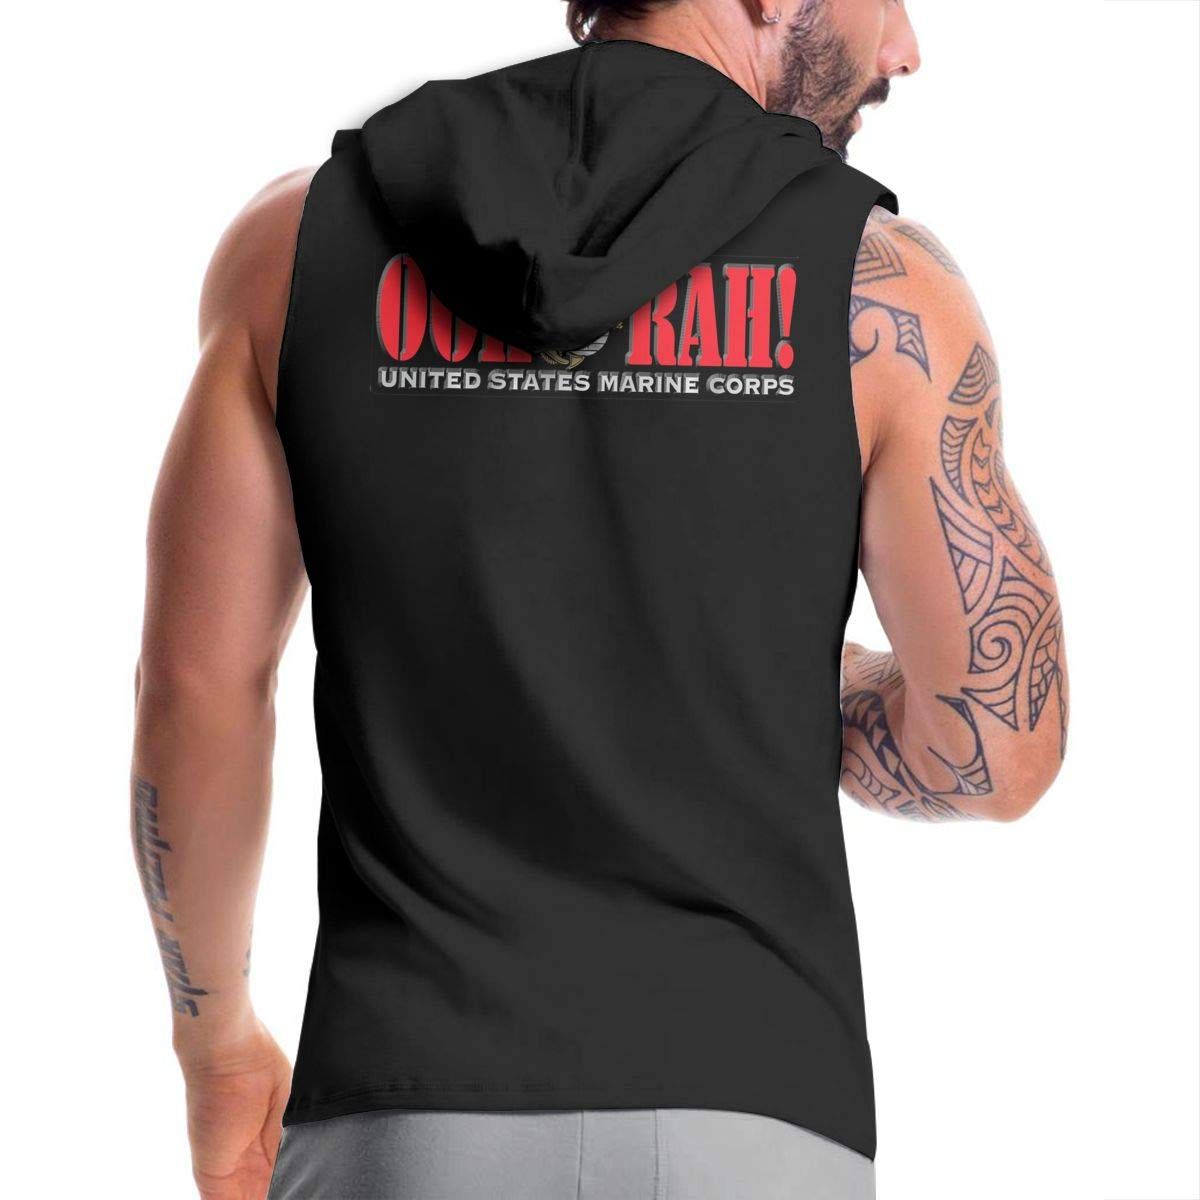 NMBOJR OOH RAH US Marine Corps Mens Hipster Hip Hop Hoodies Shirts